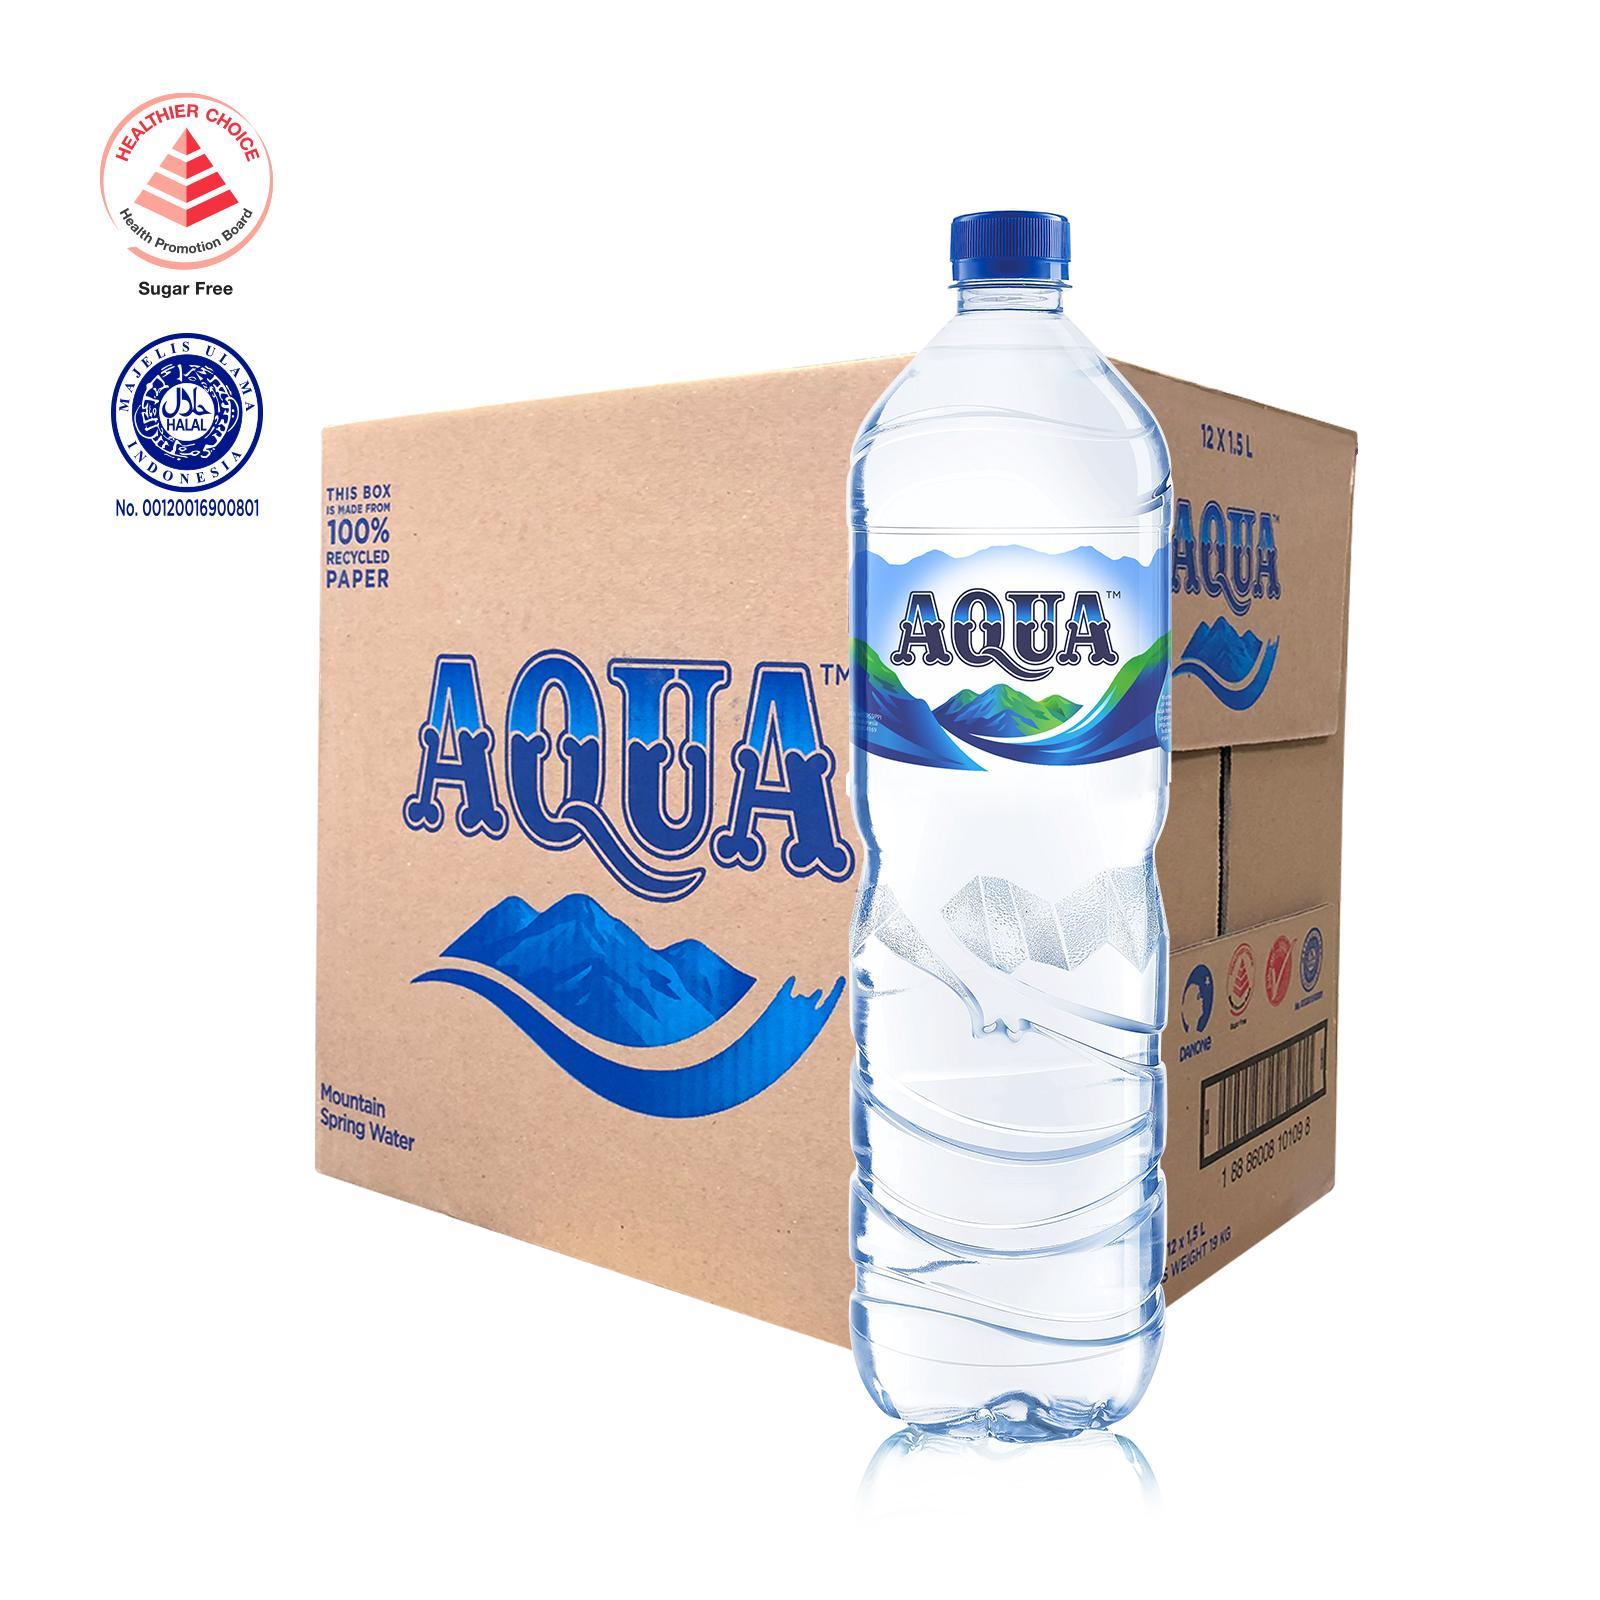 AQUA Mountain Spring Water 24sX330ml